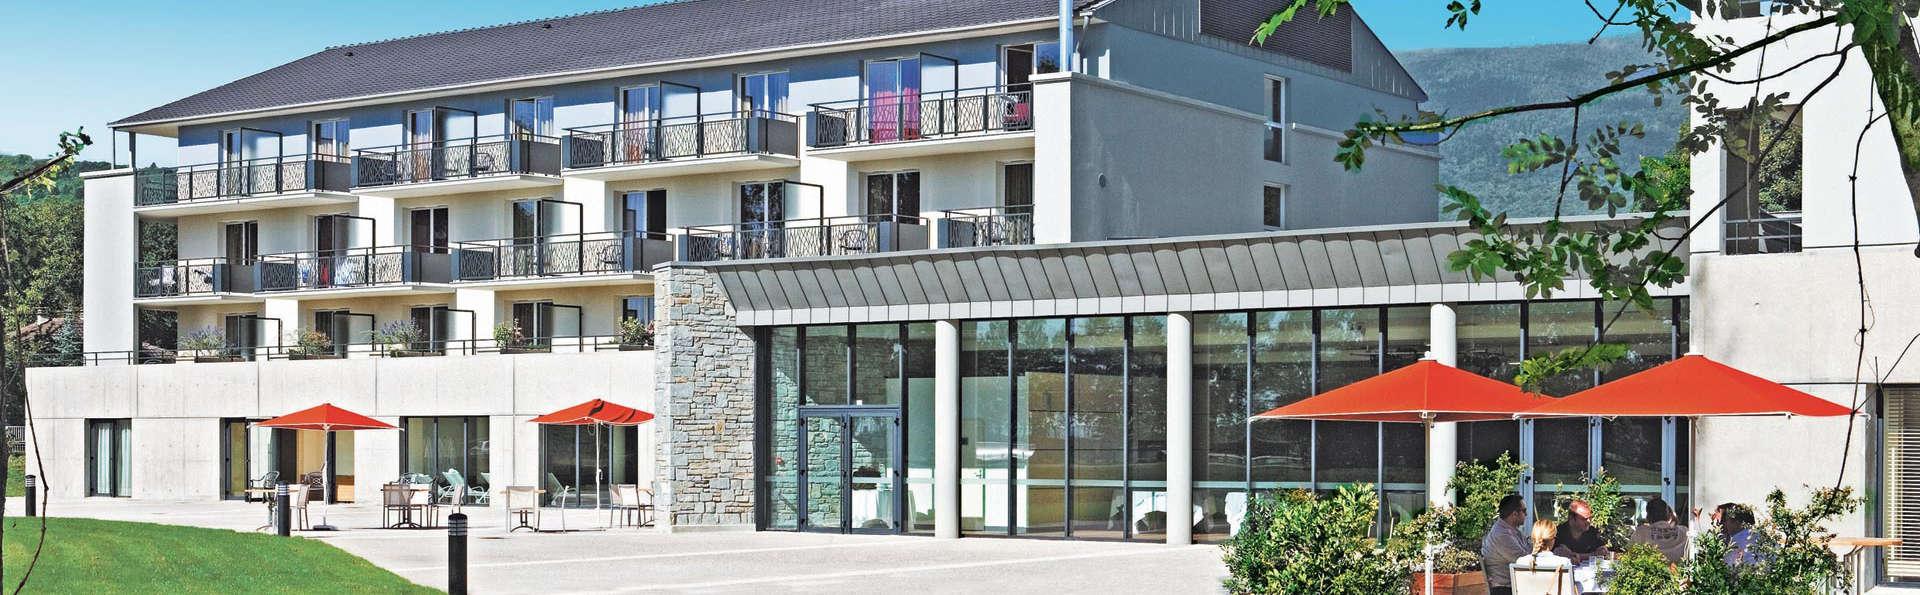 Hôtel Vacances Bleues - La Villa du Lac et Spa - edit_facade.jpg